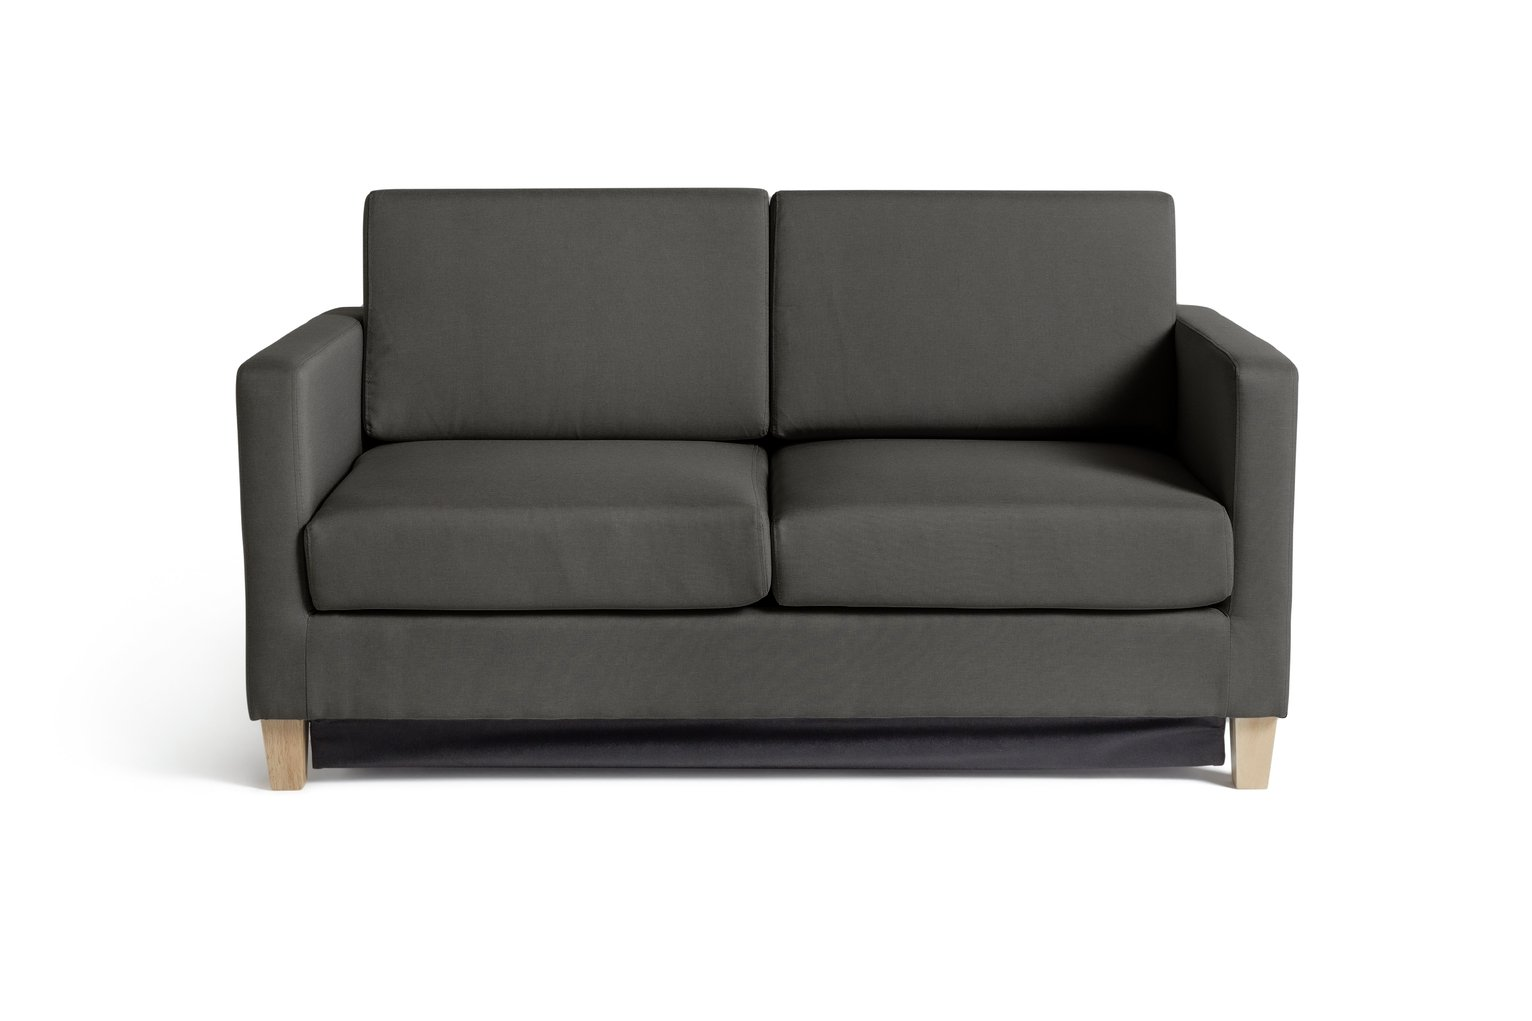 Argos Home Rosie 2 Seater Fabric Sofa Bed - Grey